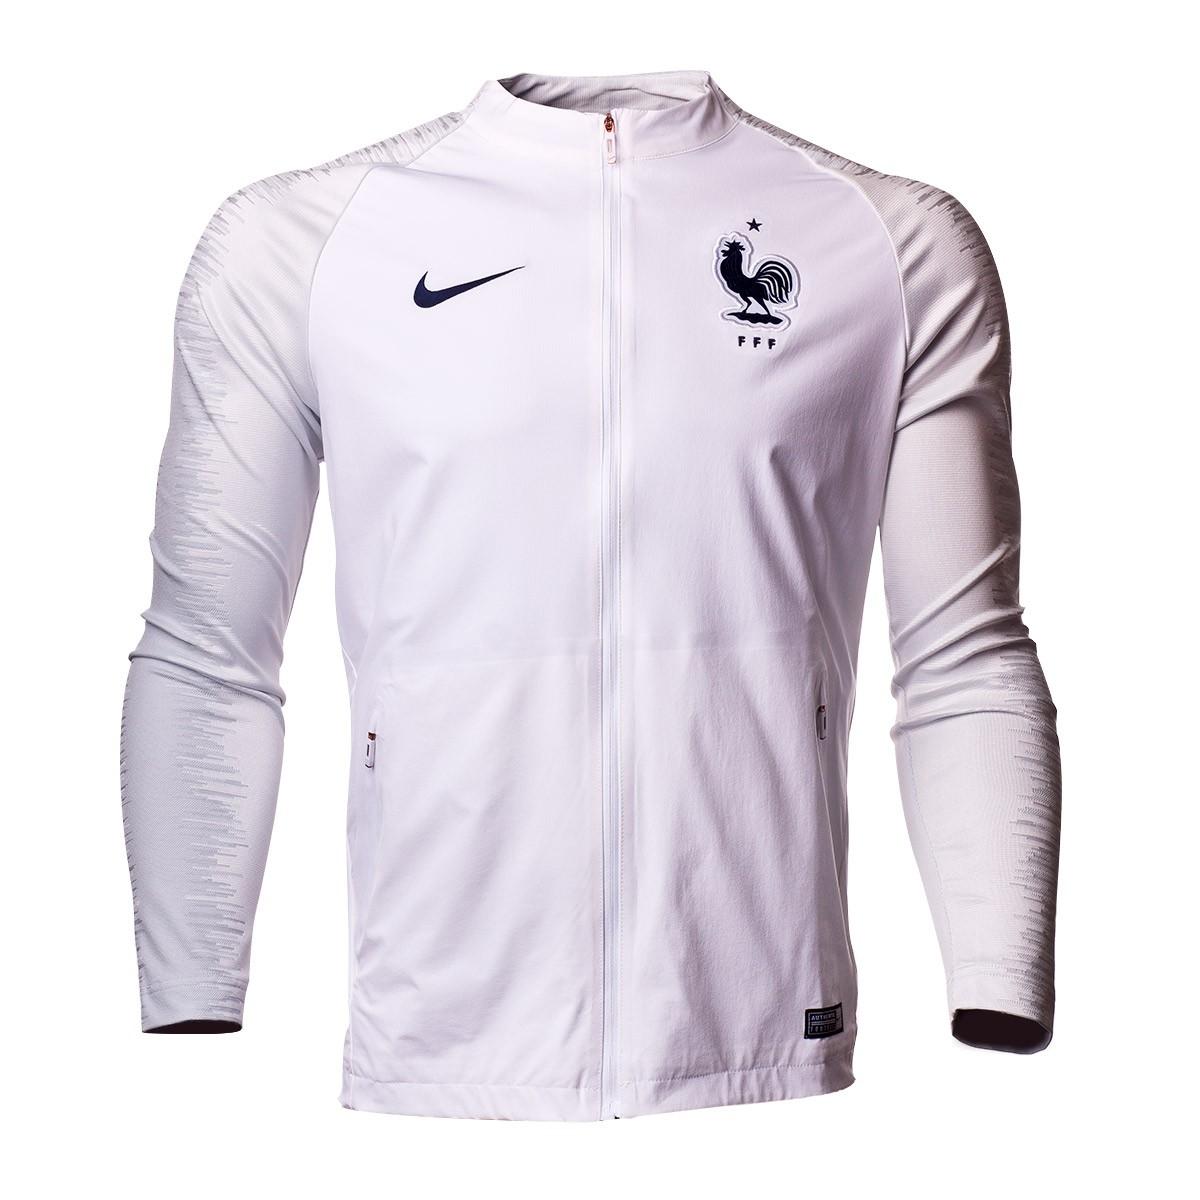 2b2226a21 Jacket Nike France Pre-Match Strike 2018-2019 White-Pure platinum ...